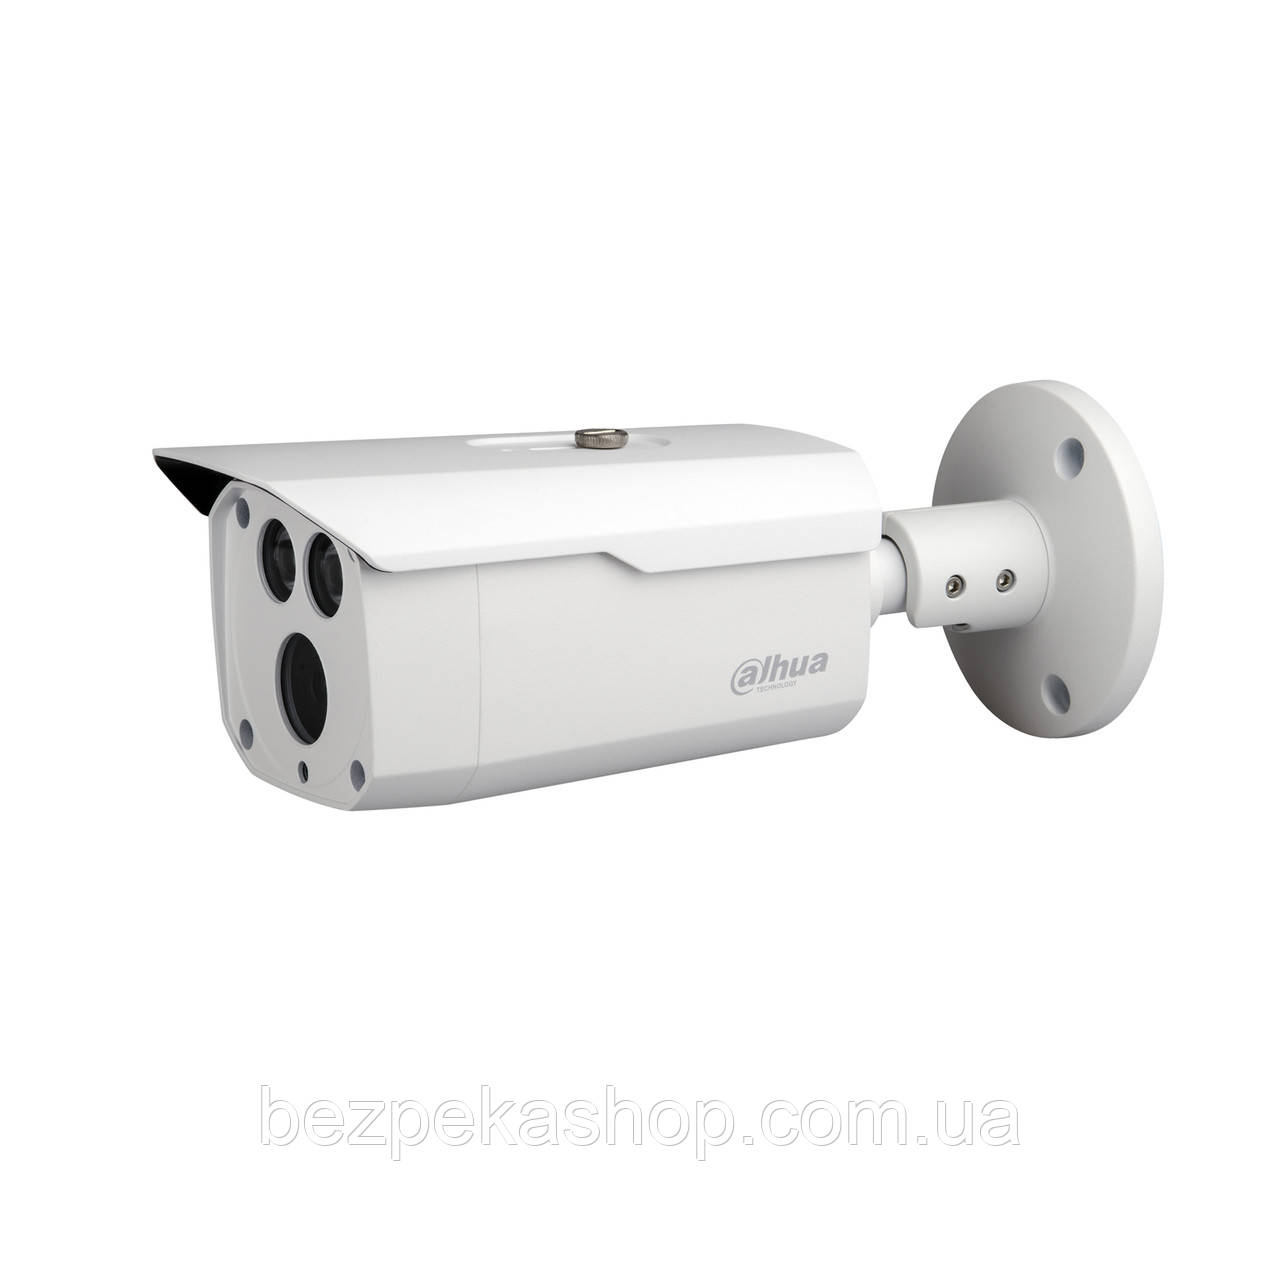 DH-HAC-HFW1400DP-B (6 мм)